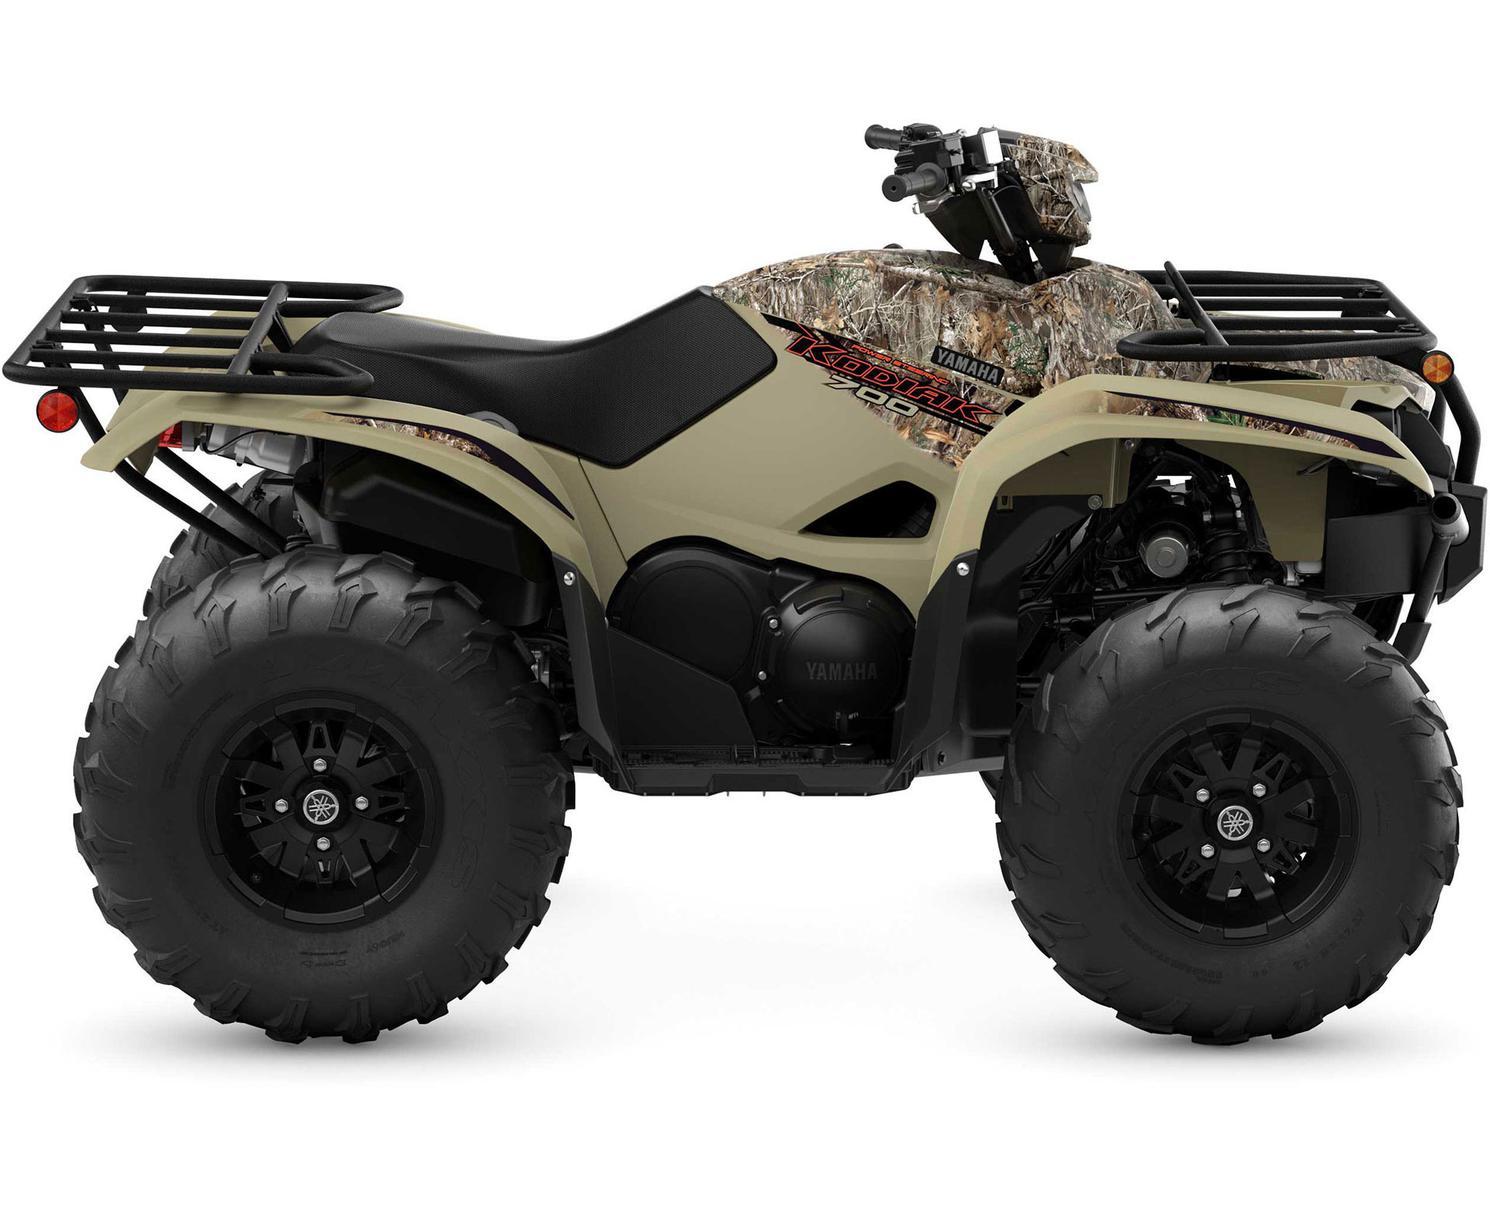 Yamaha Kodiak 700 EPS Beige Automnal / Realtree Edge 2022